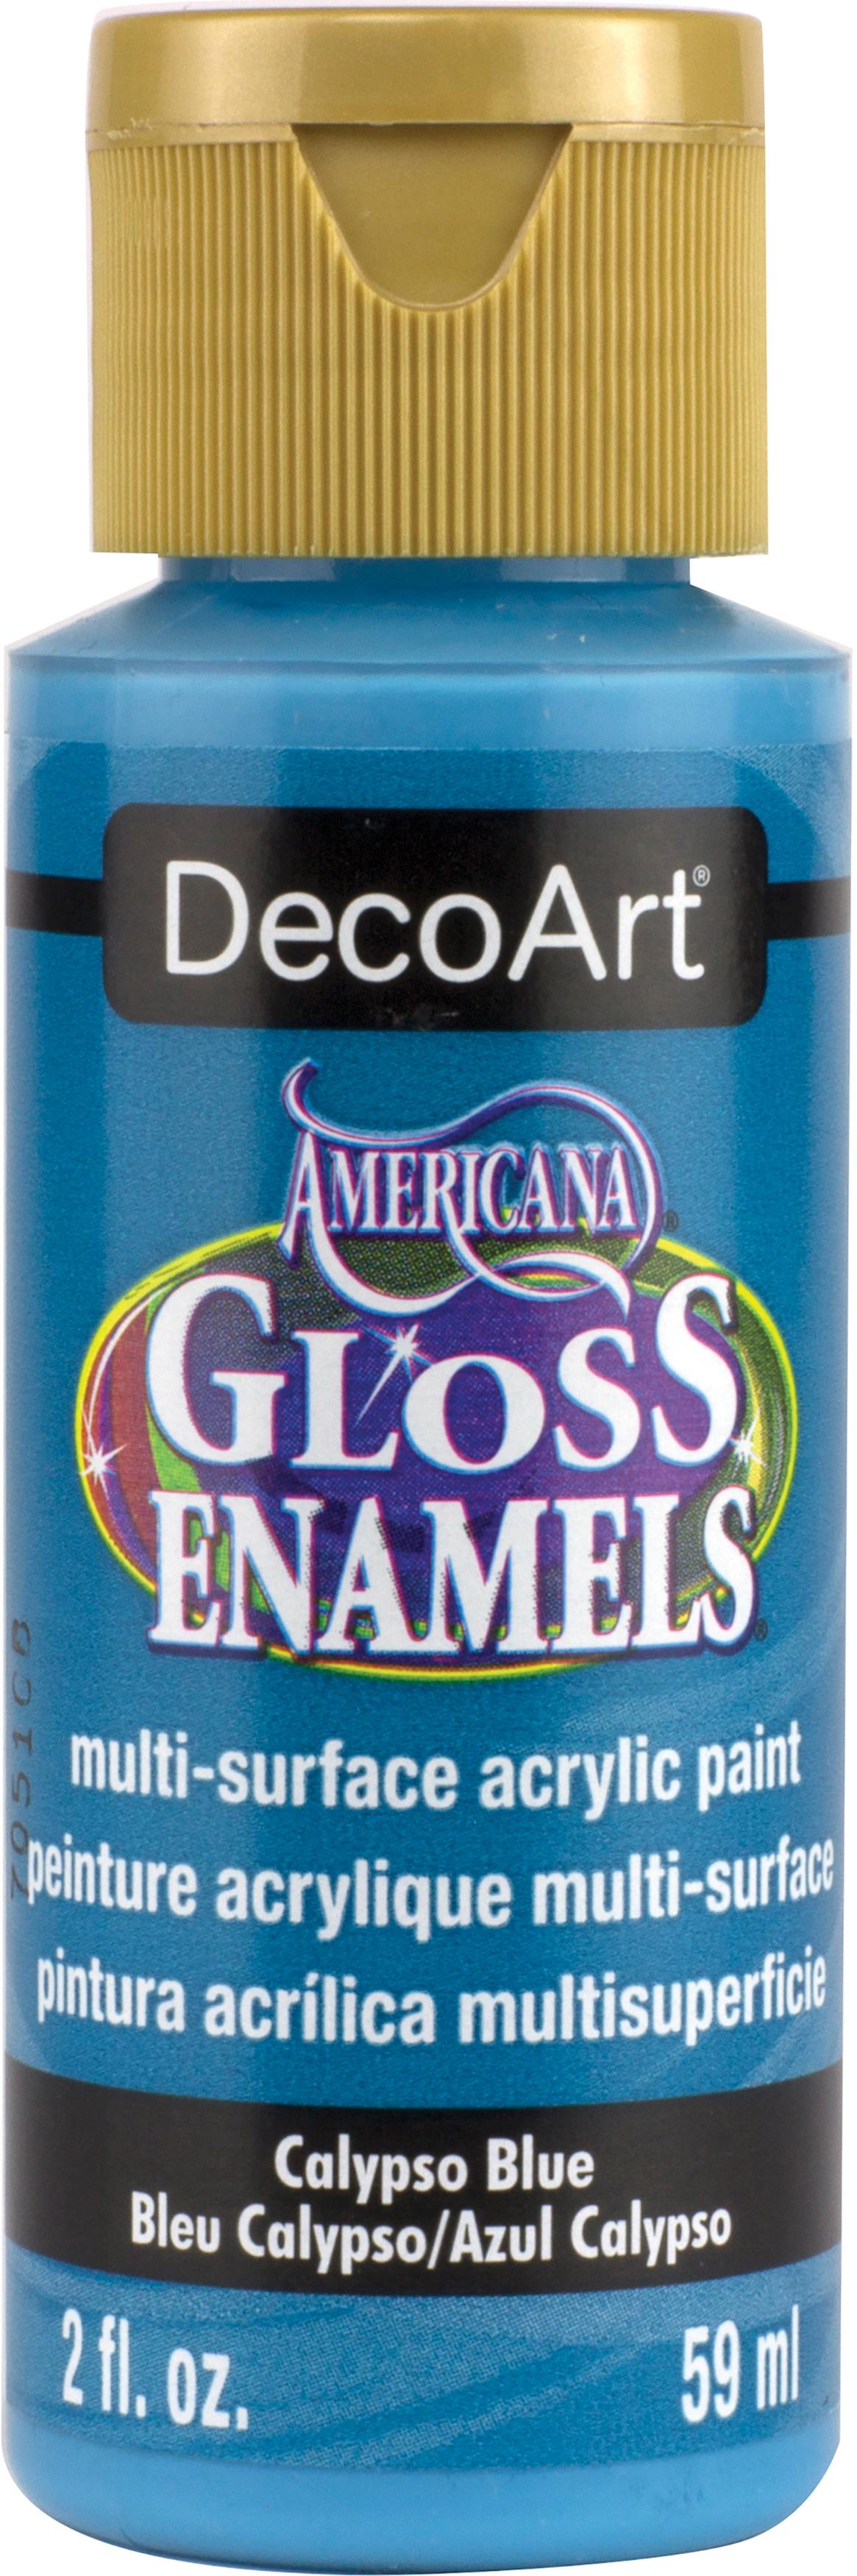 Americana Gloss Enamels Acrylic Paint 2oz-Calypso Blue